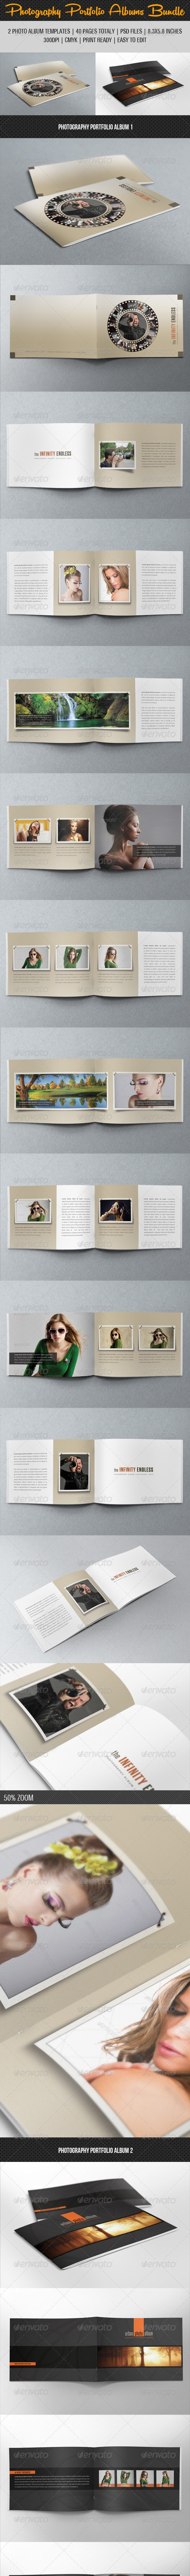 2 in 1 Photography Portfolio Album Bundle 02 - Photo Albums Print Templates